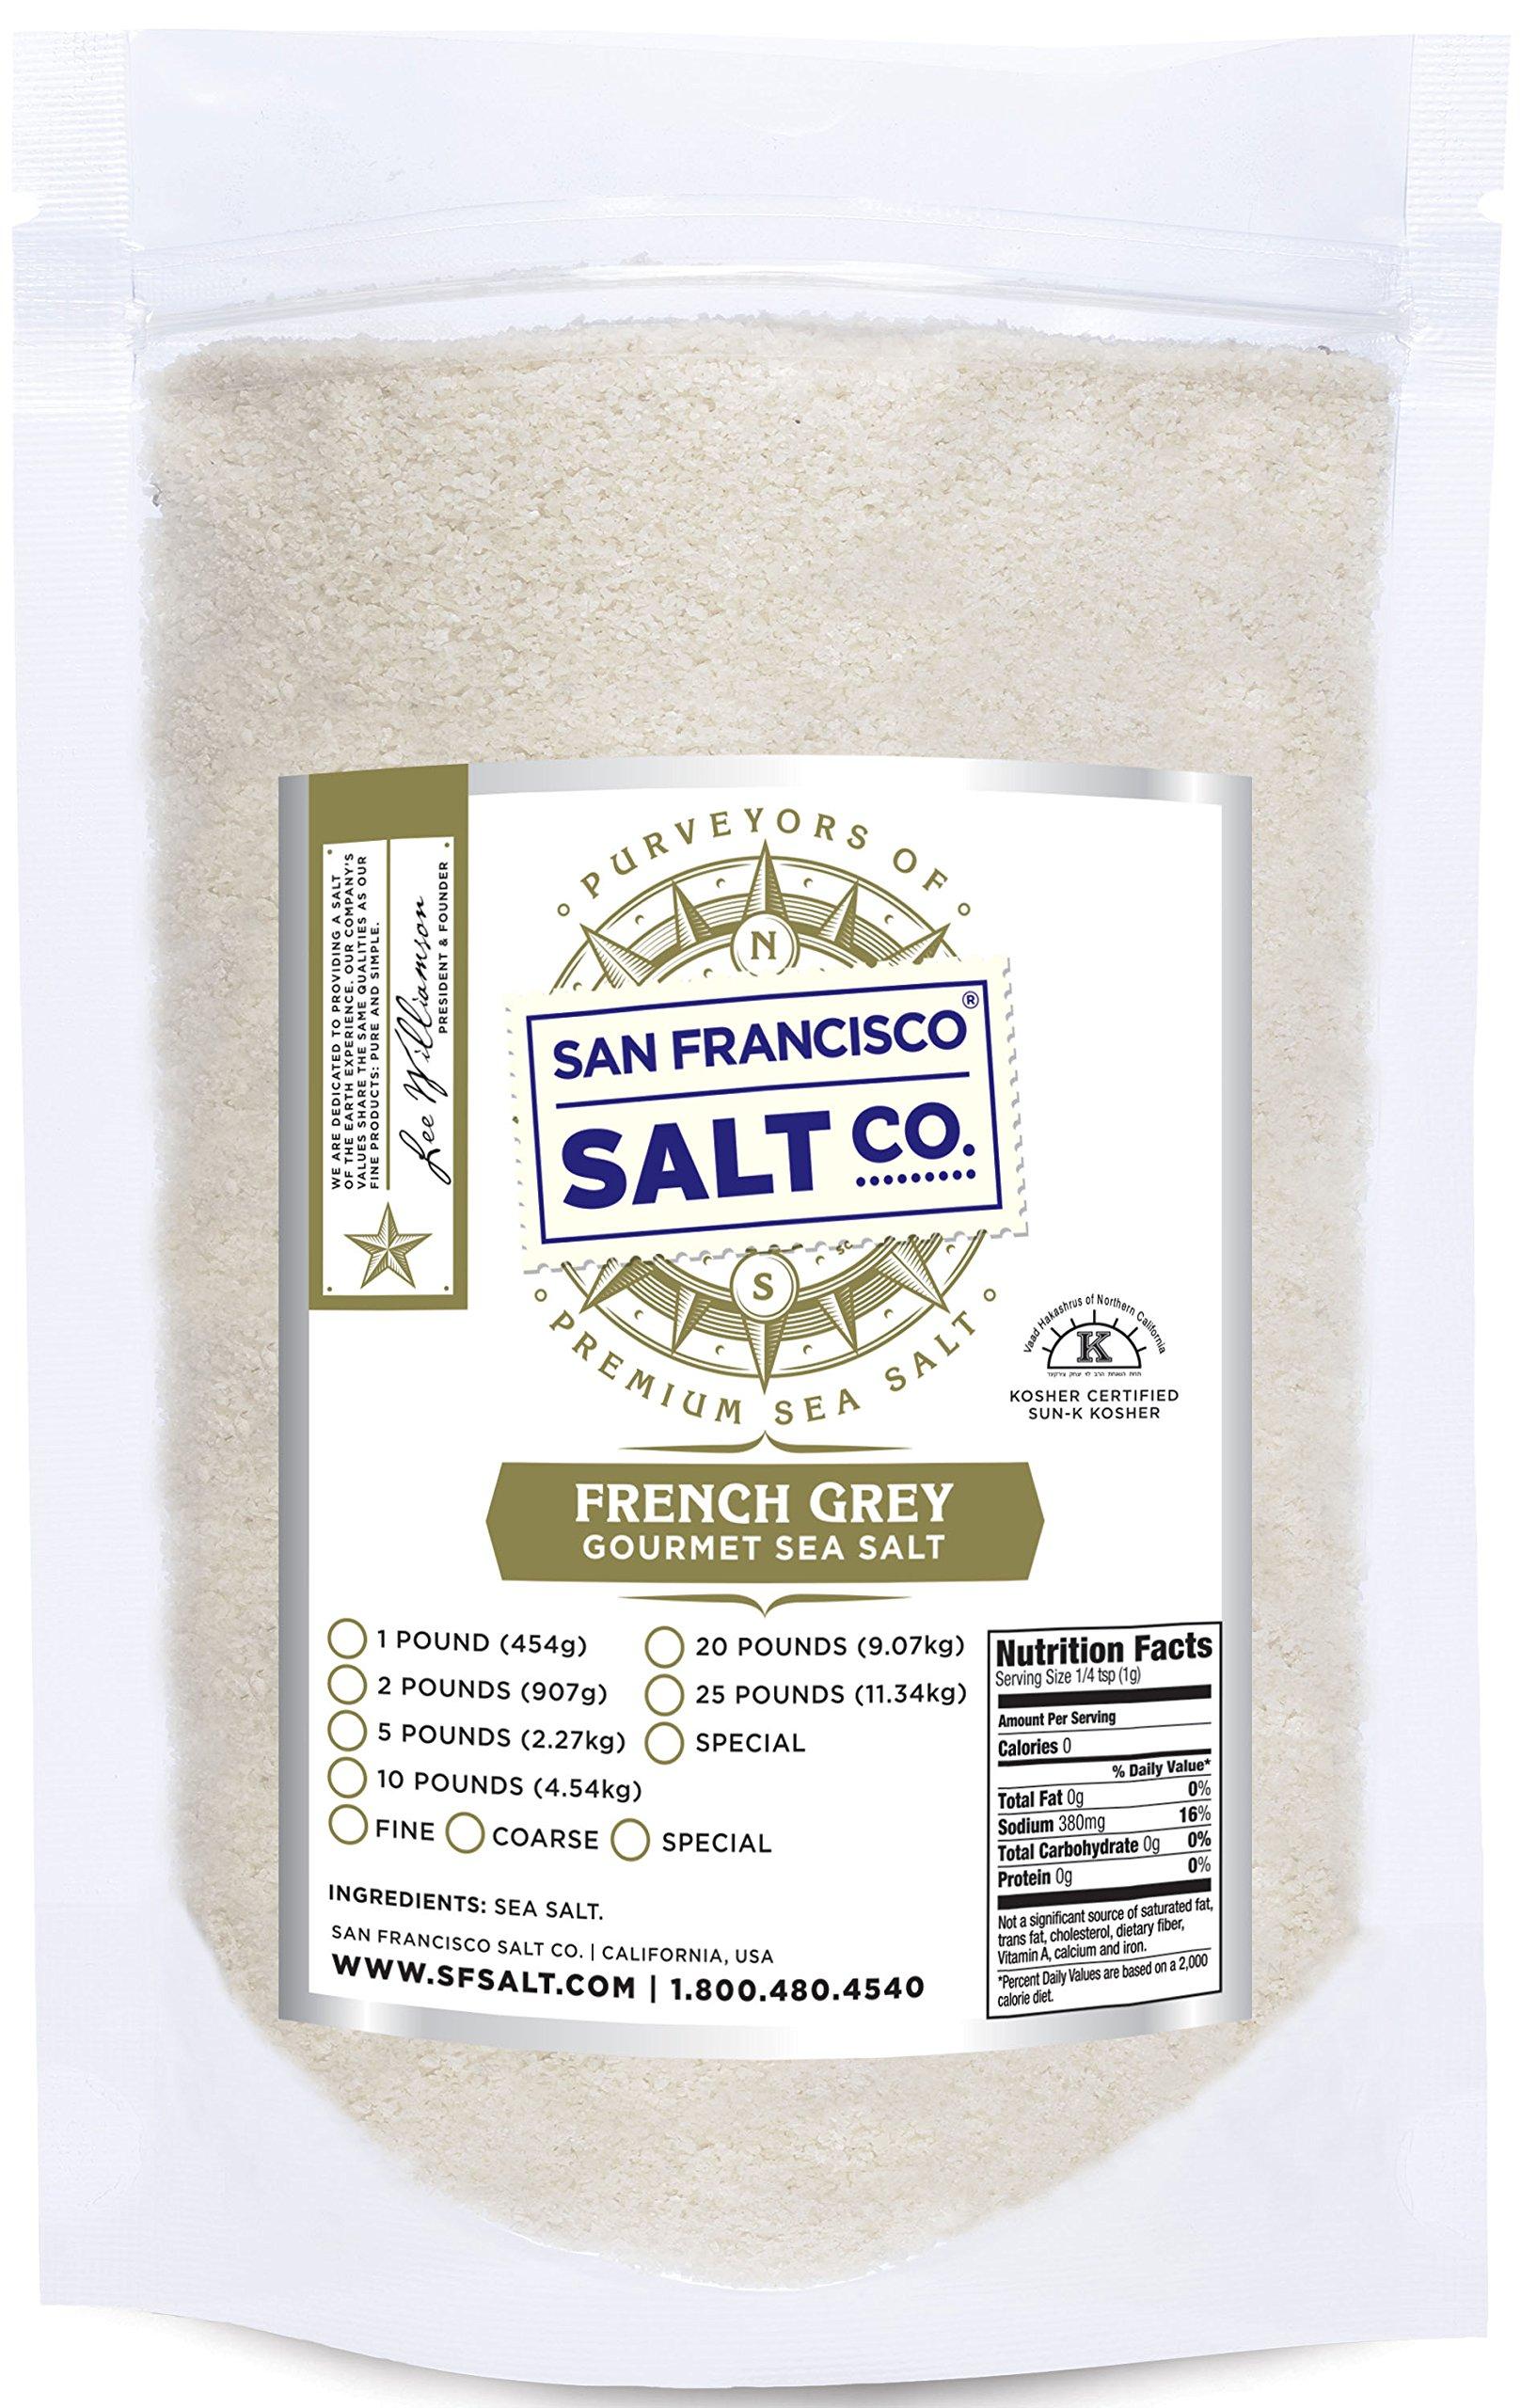 French Grey Sea Salt 10 lb. Bag Fine Grain - Sel Gris by San Francisco Salt Company